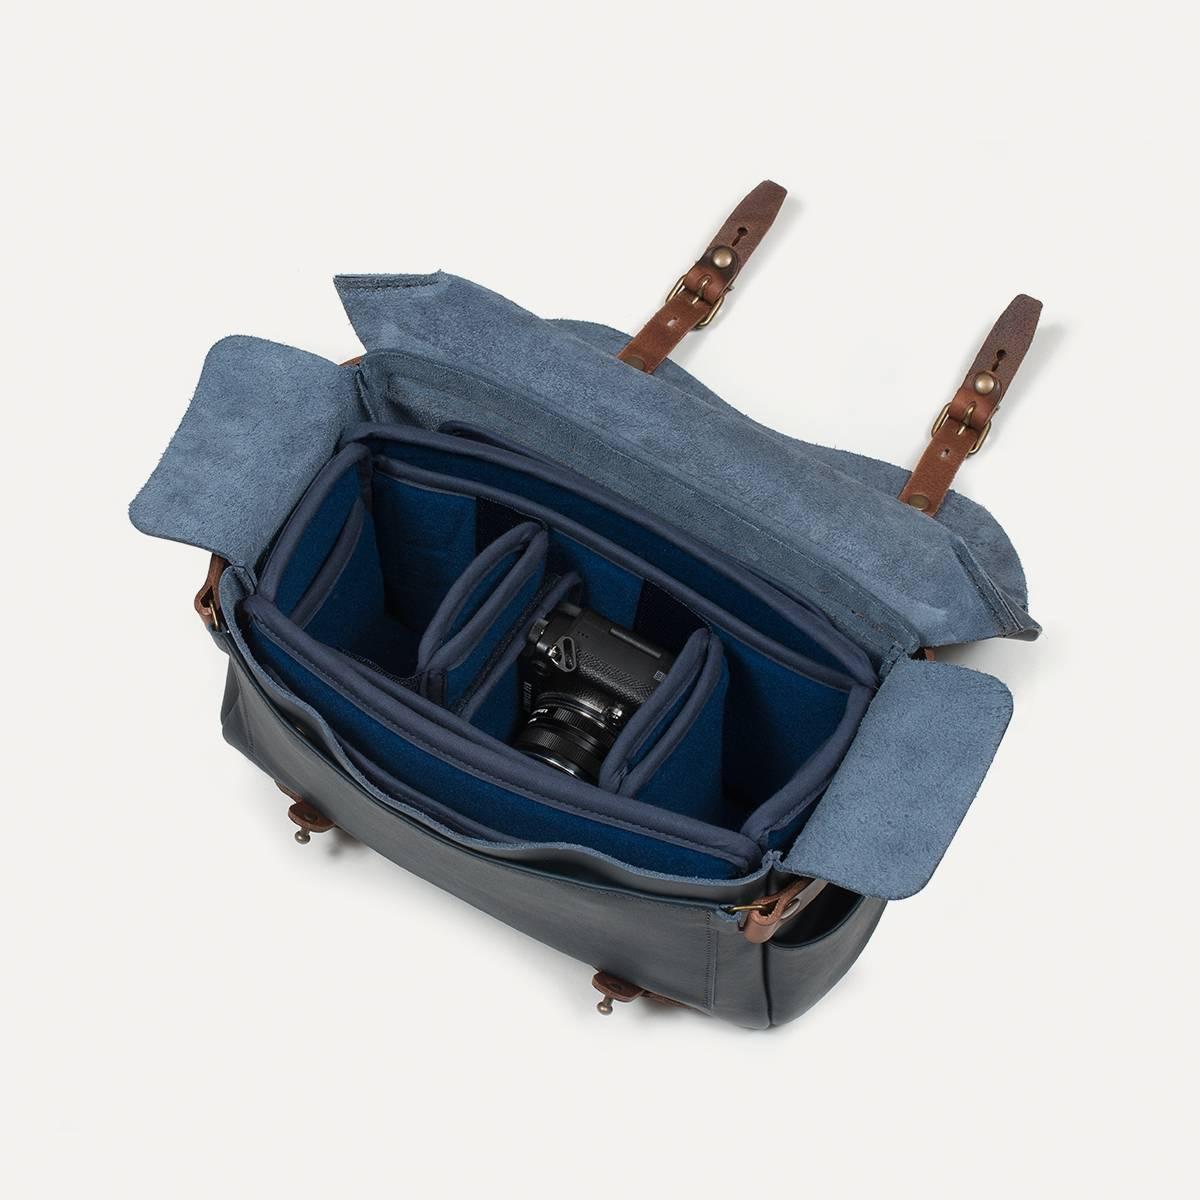 Bologne BDC Camera Bag S (image n°4)